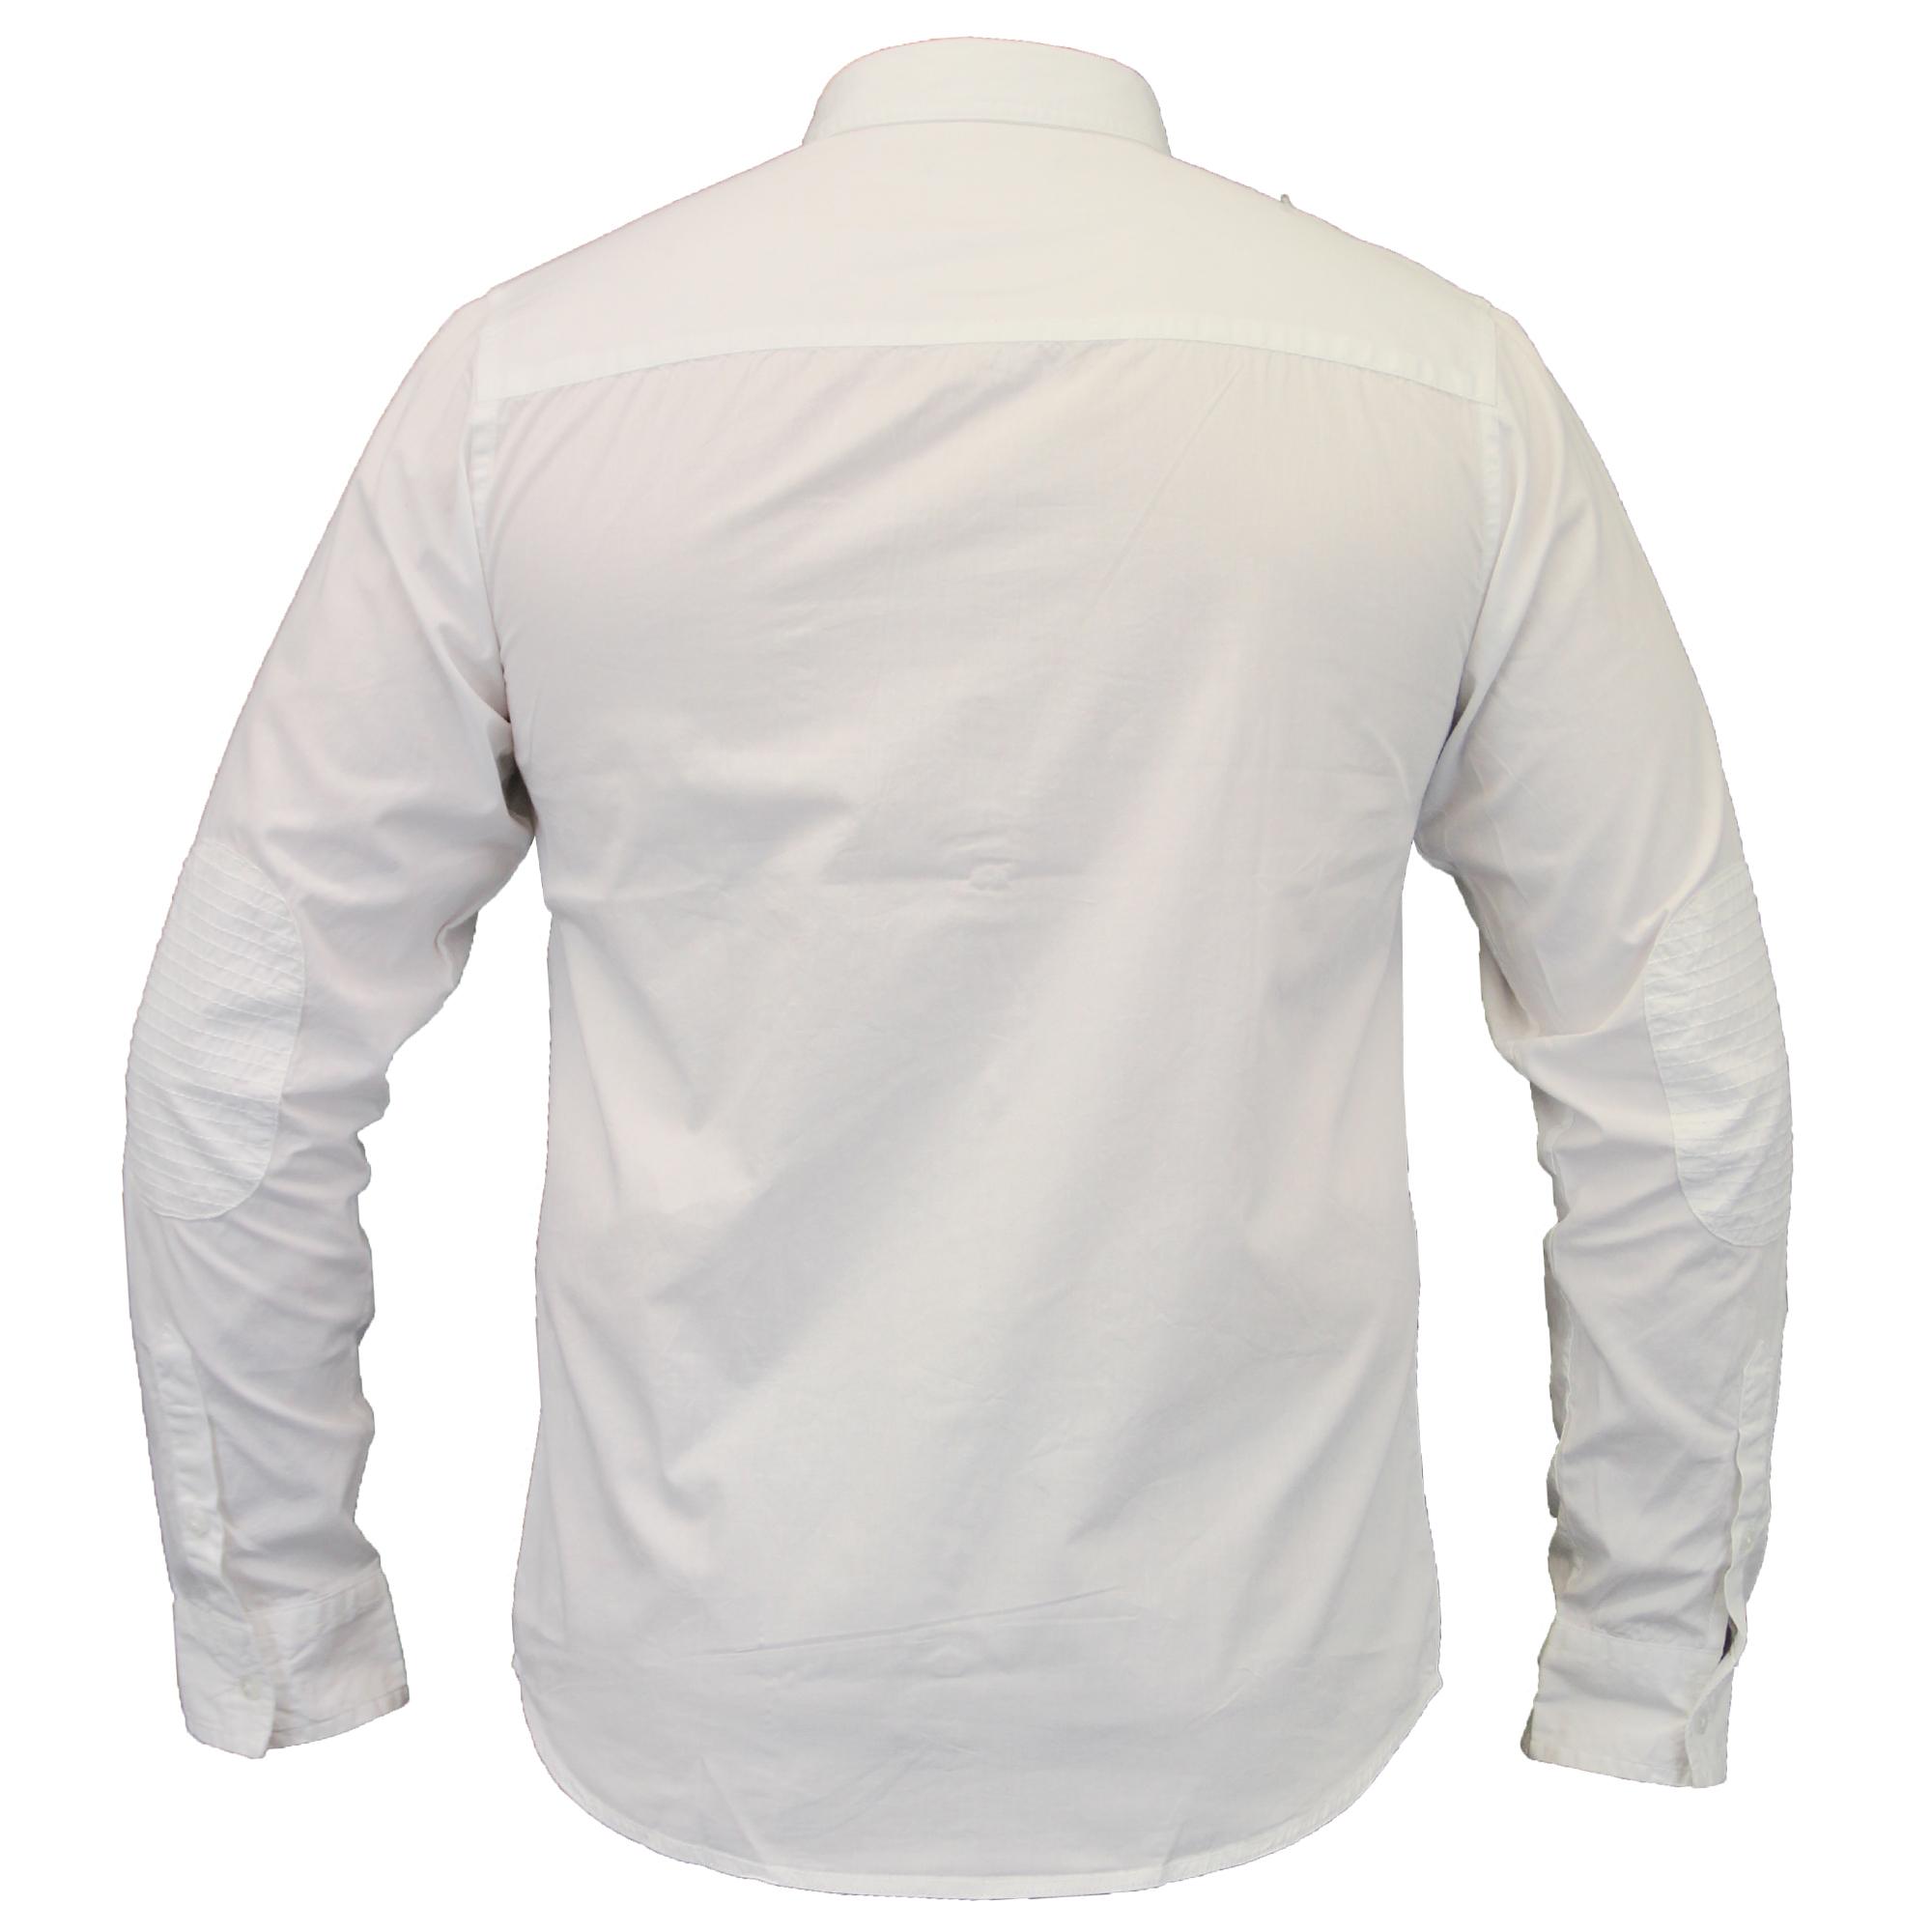 Camisas-de-vestir-para-hombre-de-alma-valiente-Smith-amp-Jones-Manga-Corta-Larga-De-Algodon-Con miniatura 12